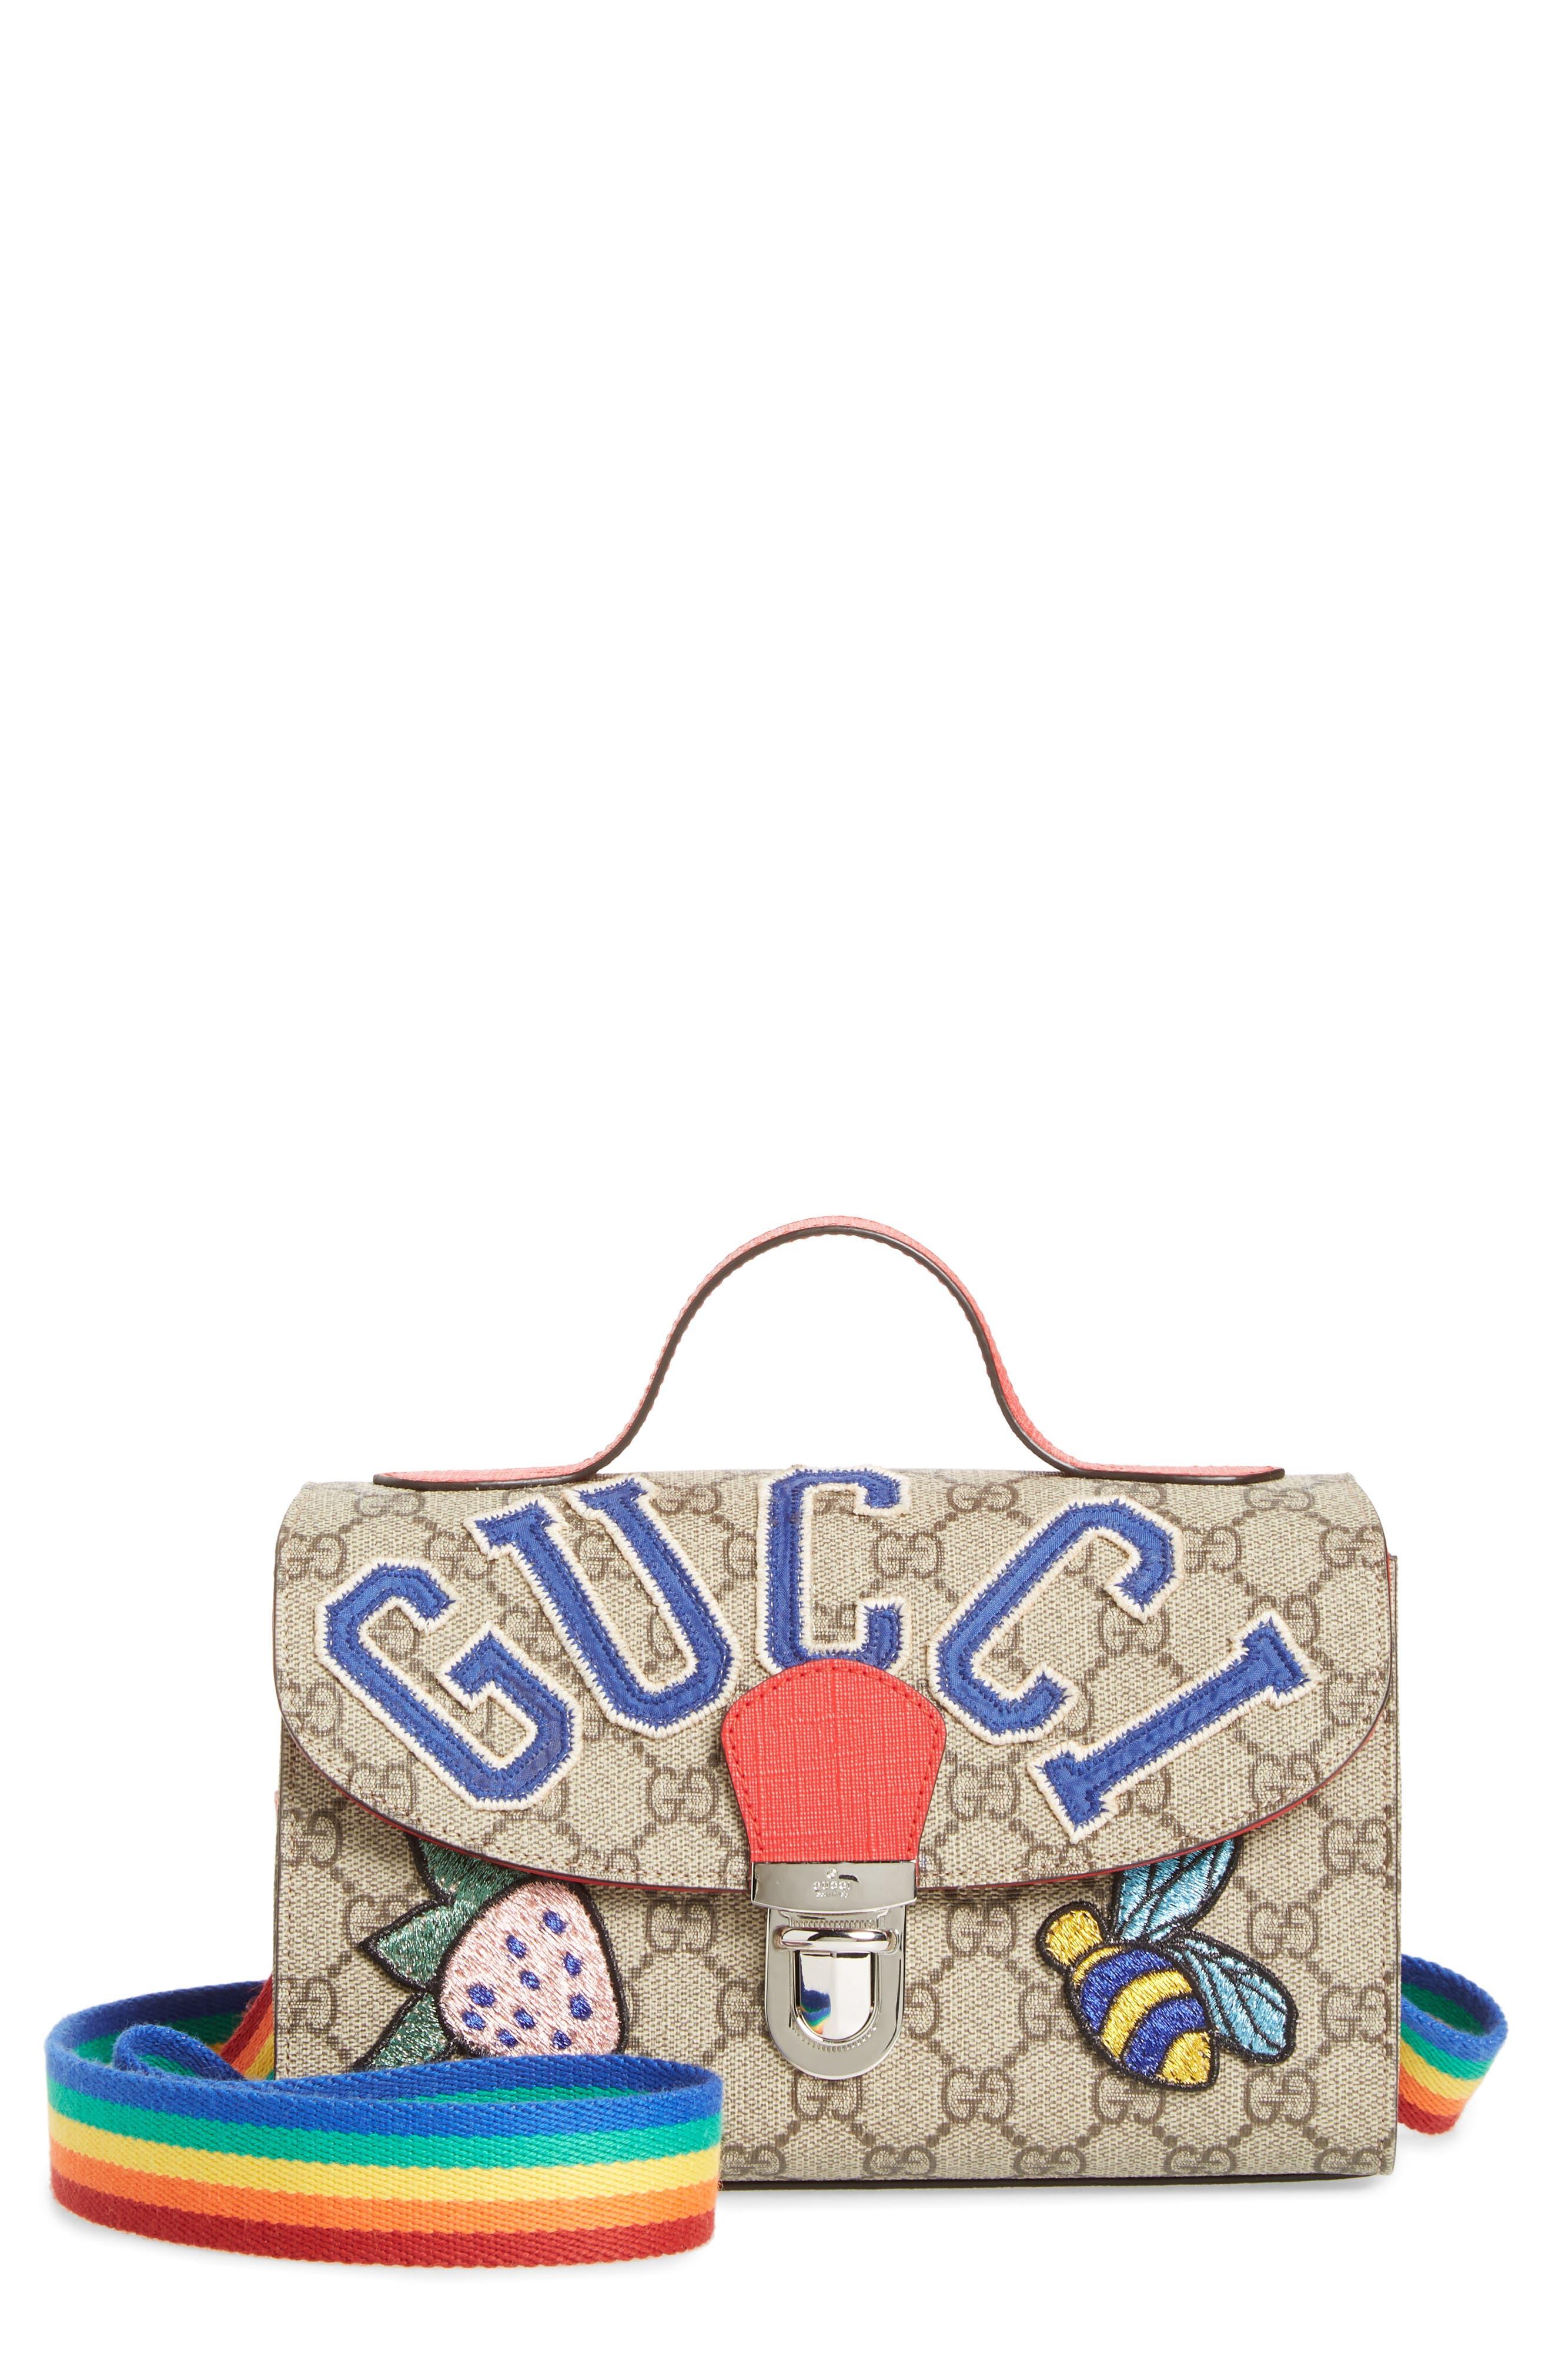 GUCCI,                             Junior GG Supreme Canvas Top Handle Bag,                             Main thumbnail 1, color,                             NERO/ VRV